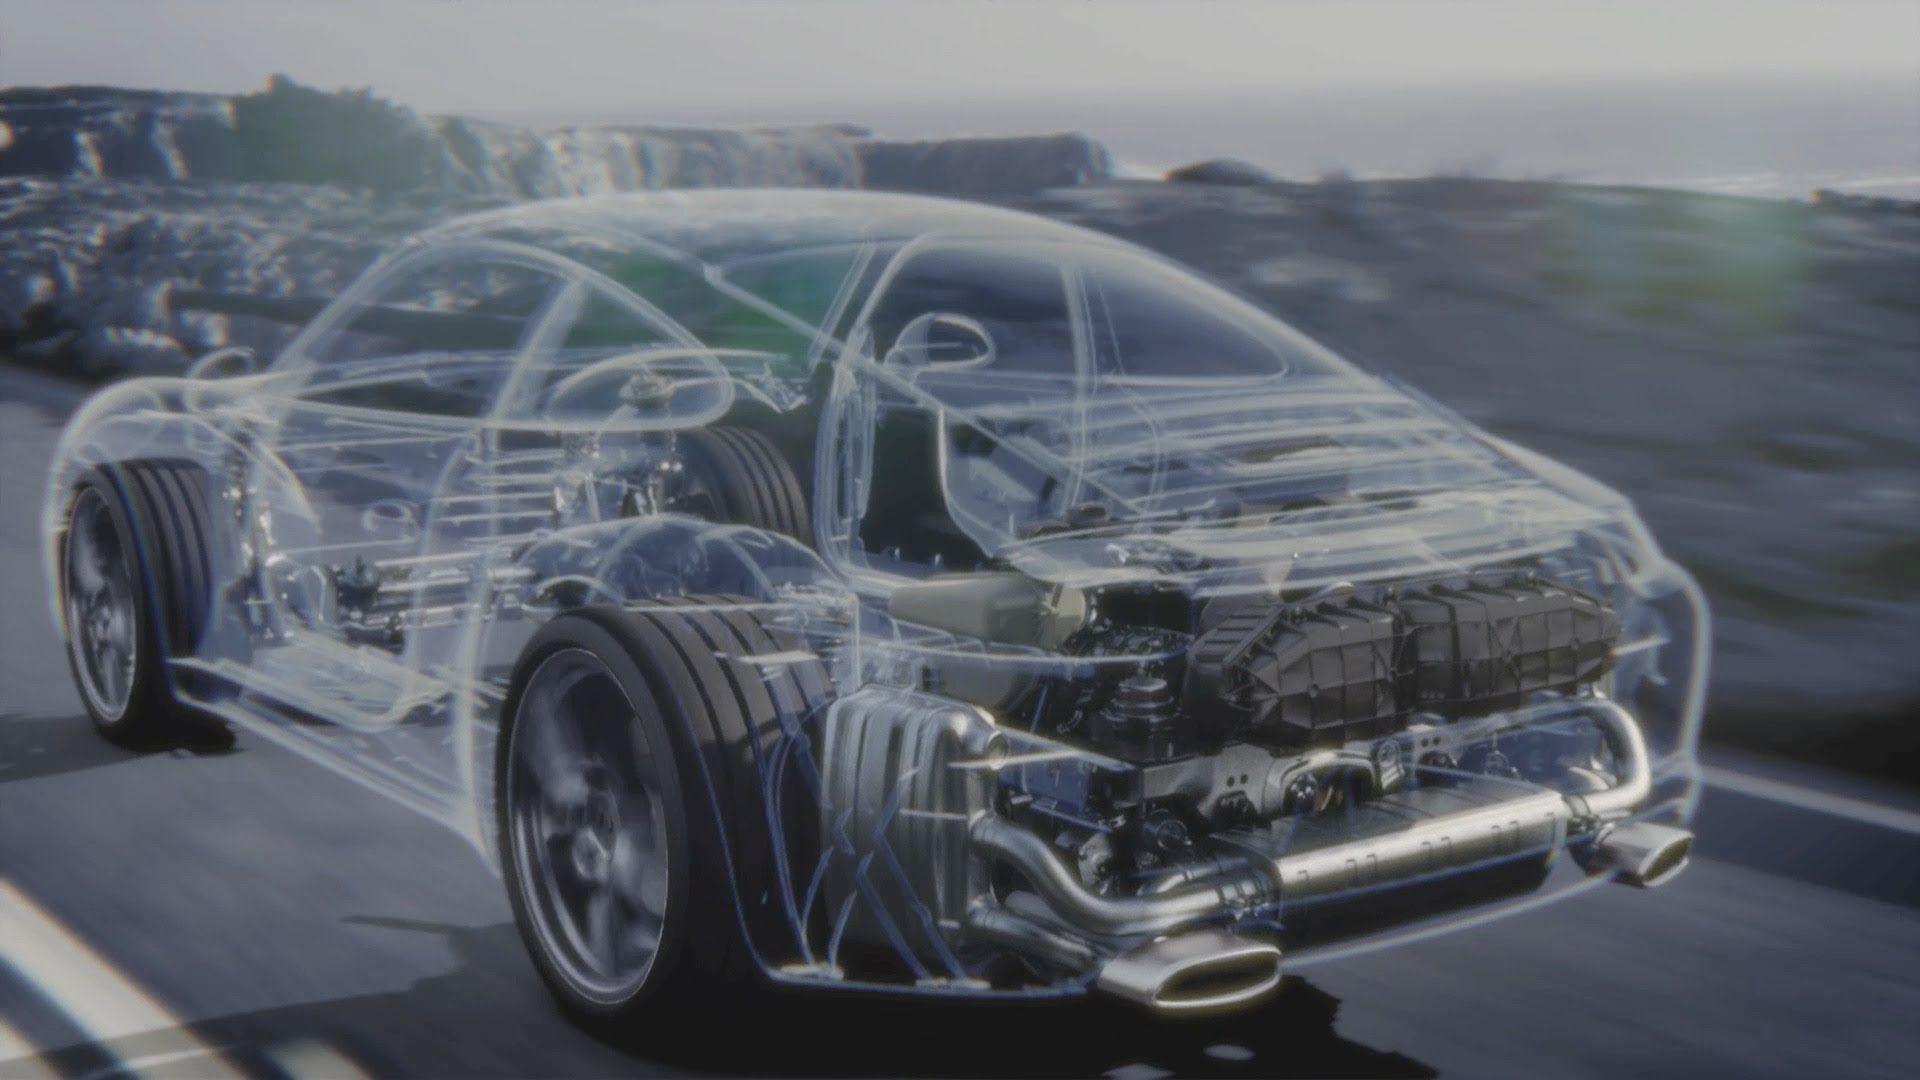 Water-cooled flat-six engine